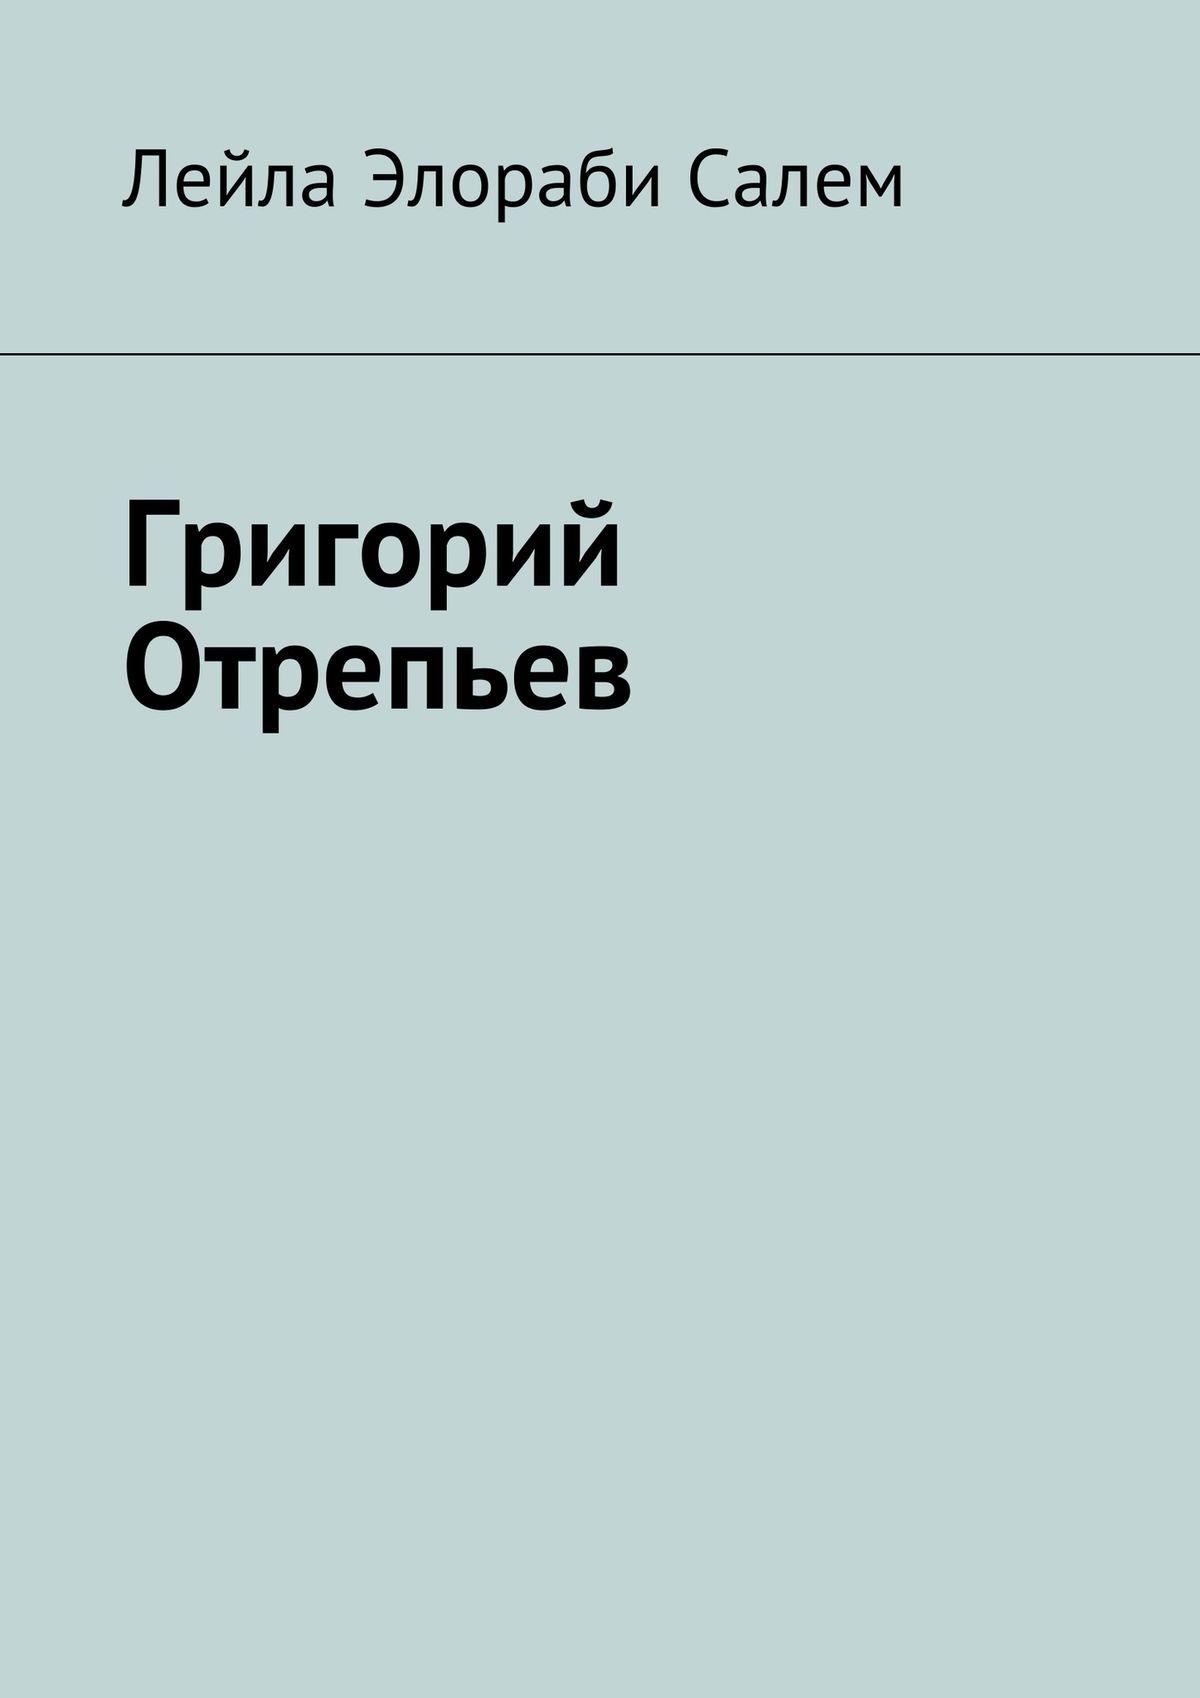 Лейла Элораби Салем Григорий Отрепьев цена